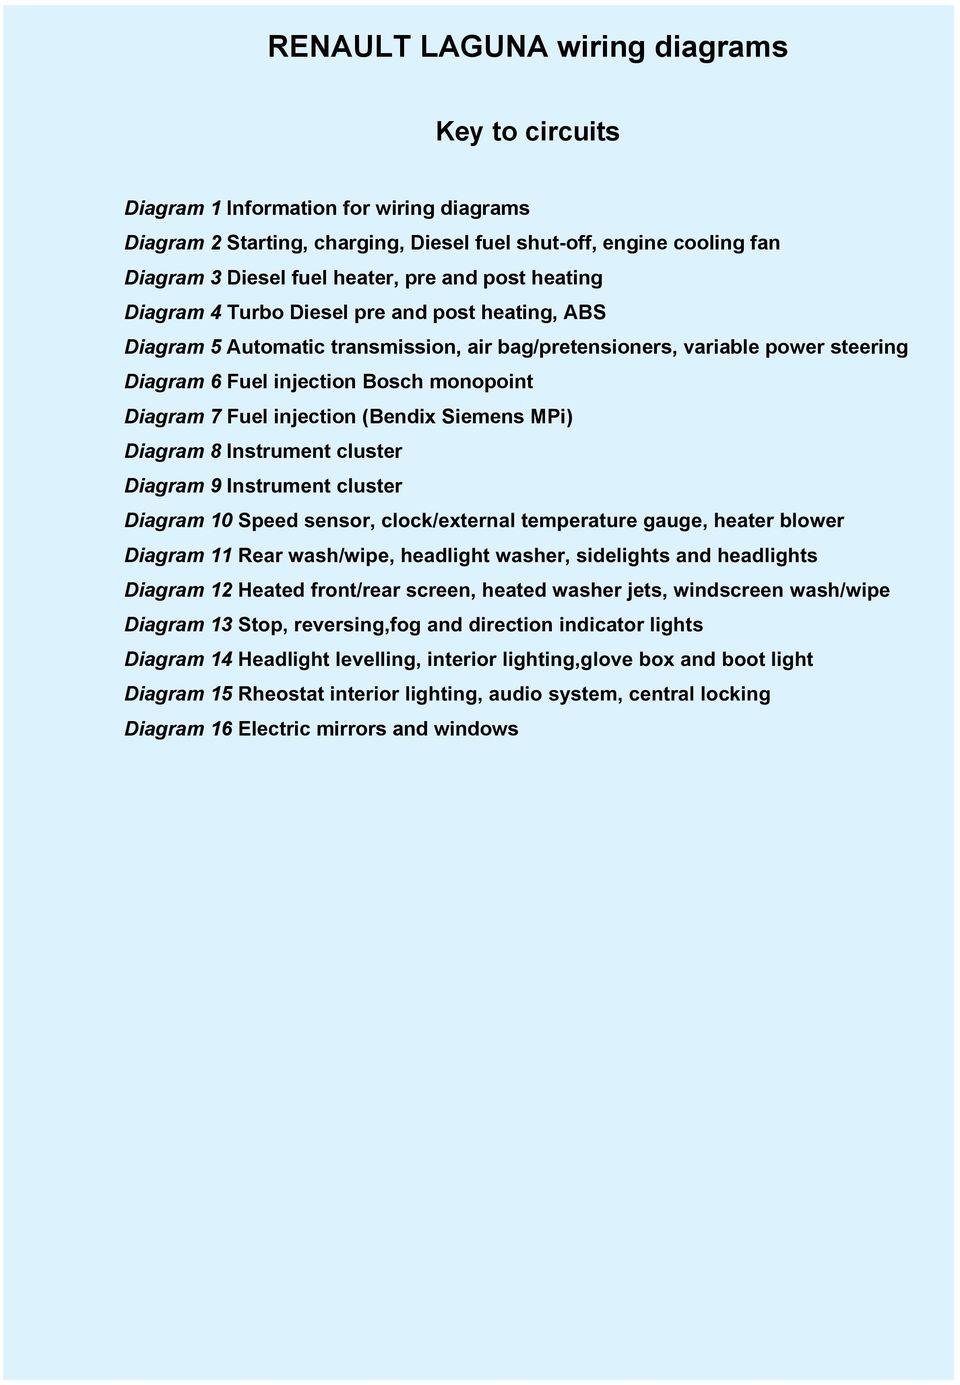 Mazda Wiring Diagram Abbreviations Free Download Wiring Diagram ...